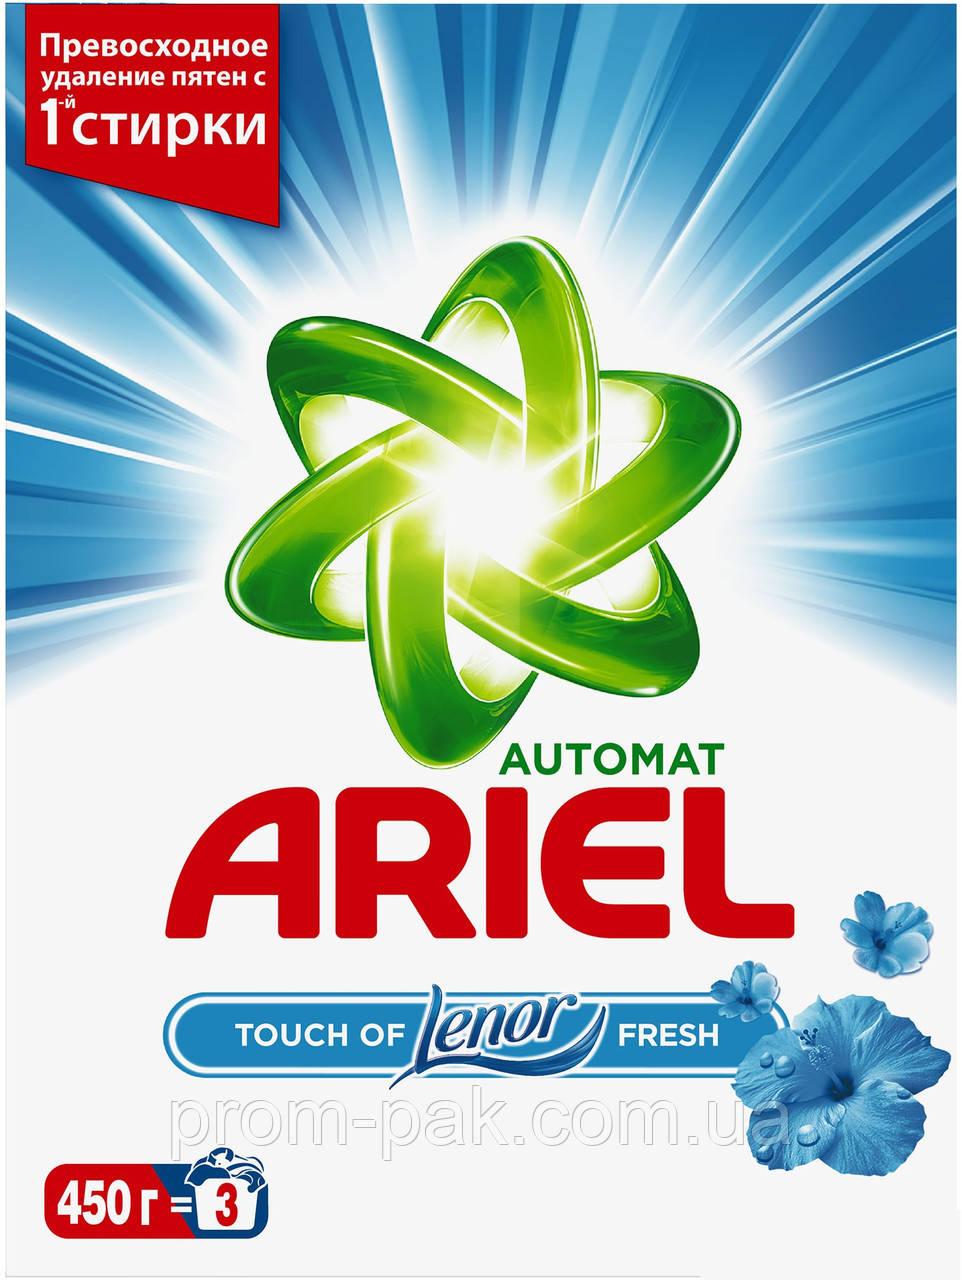 ARIEL Автомат порошок ,Touch of Lenor Fresh 450г